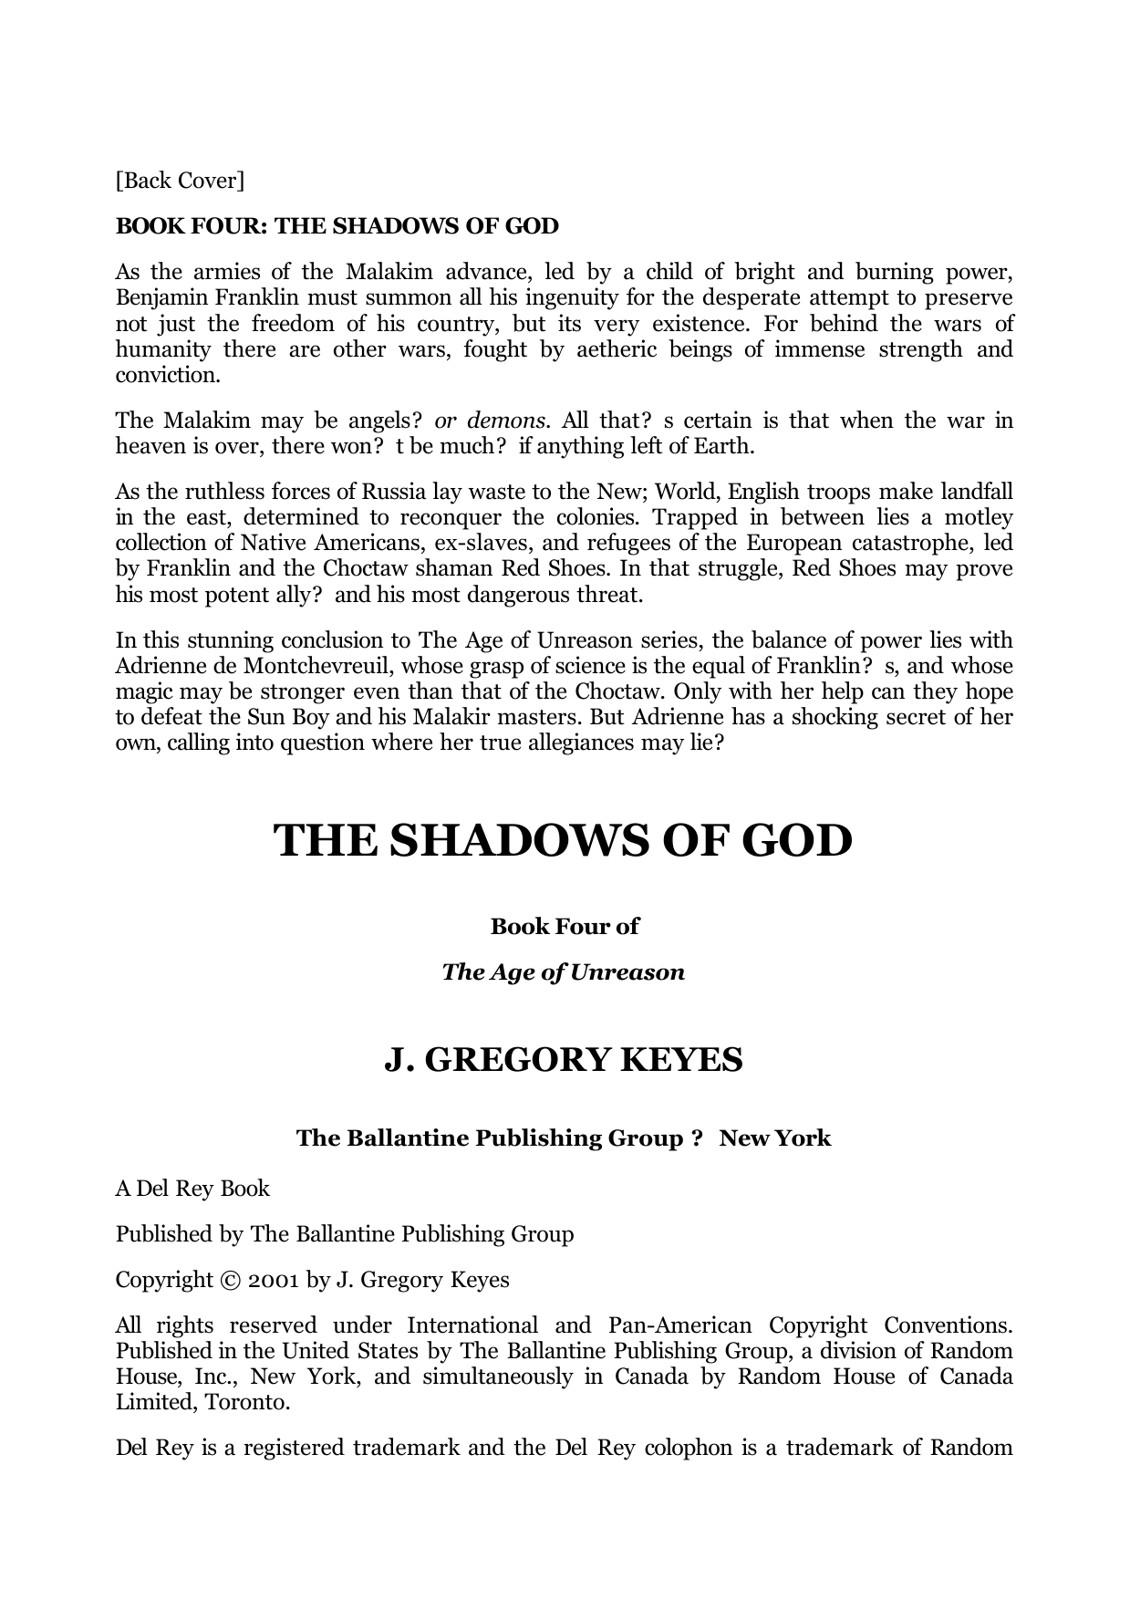 Книга: The Shadows of God